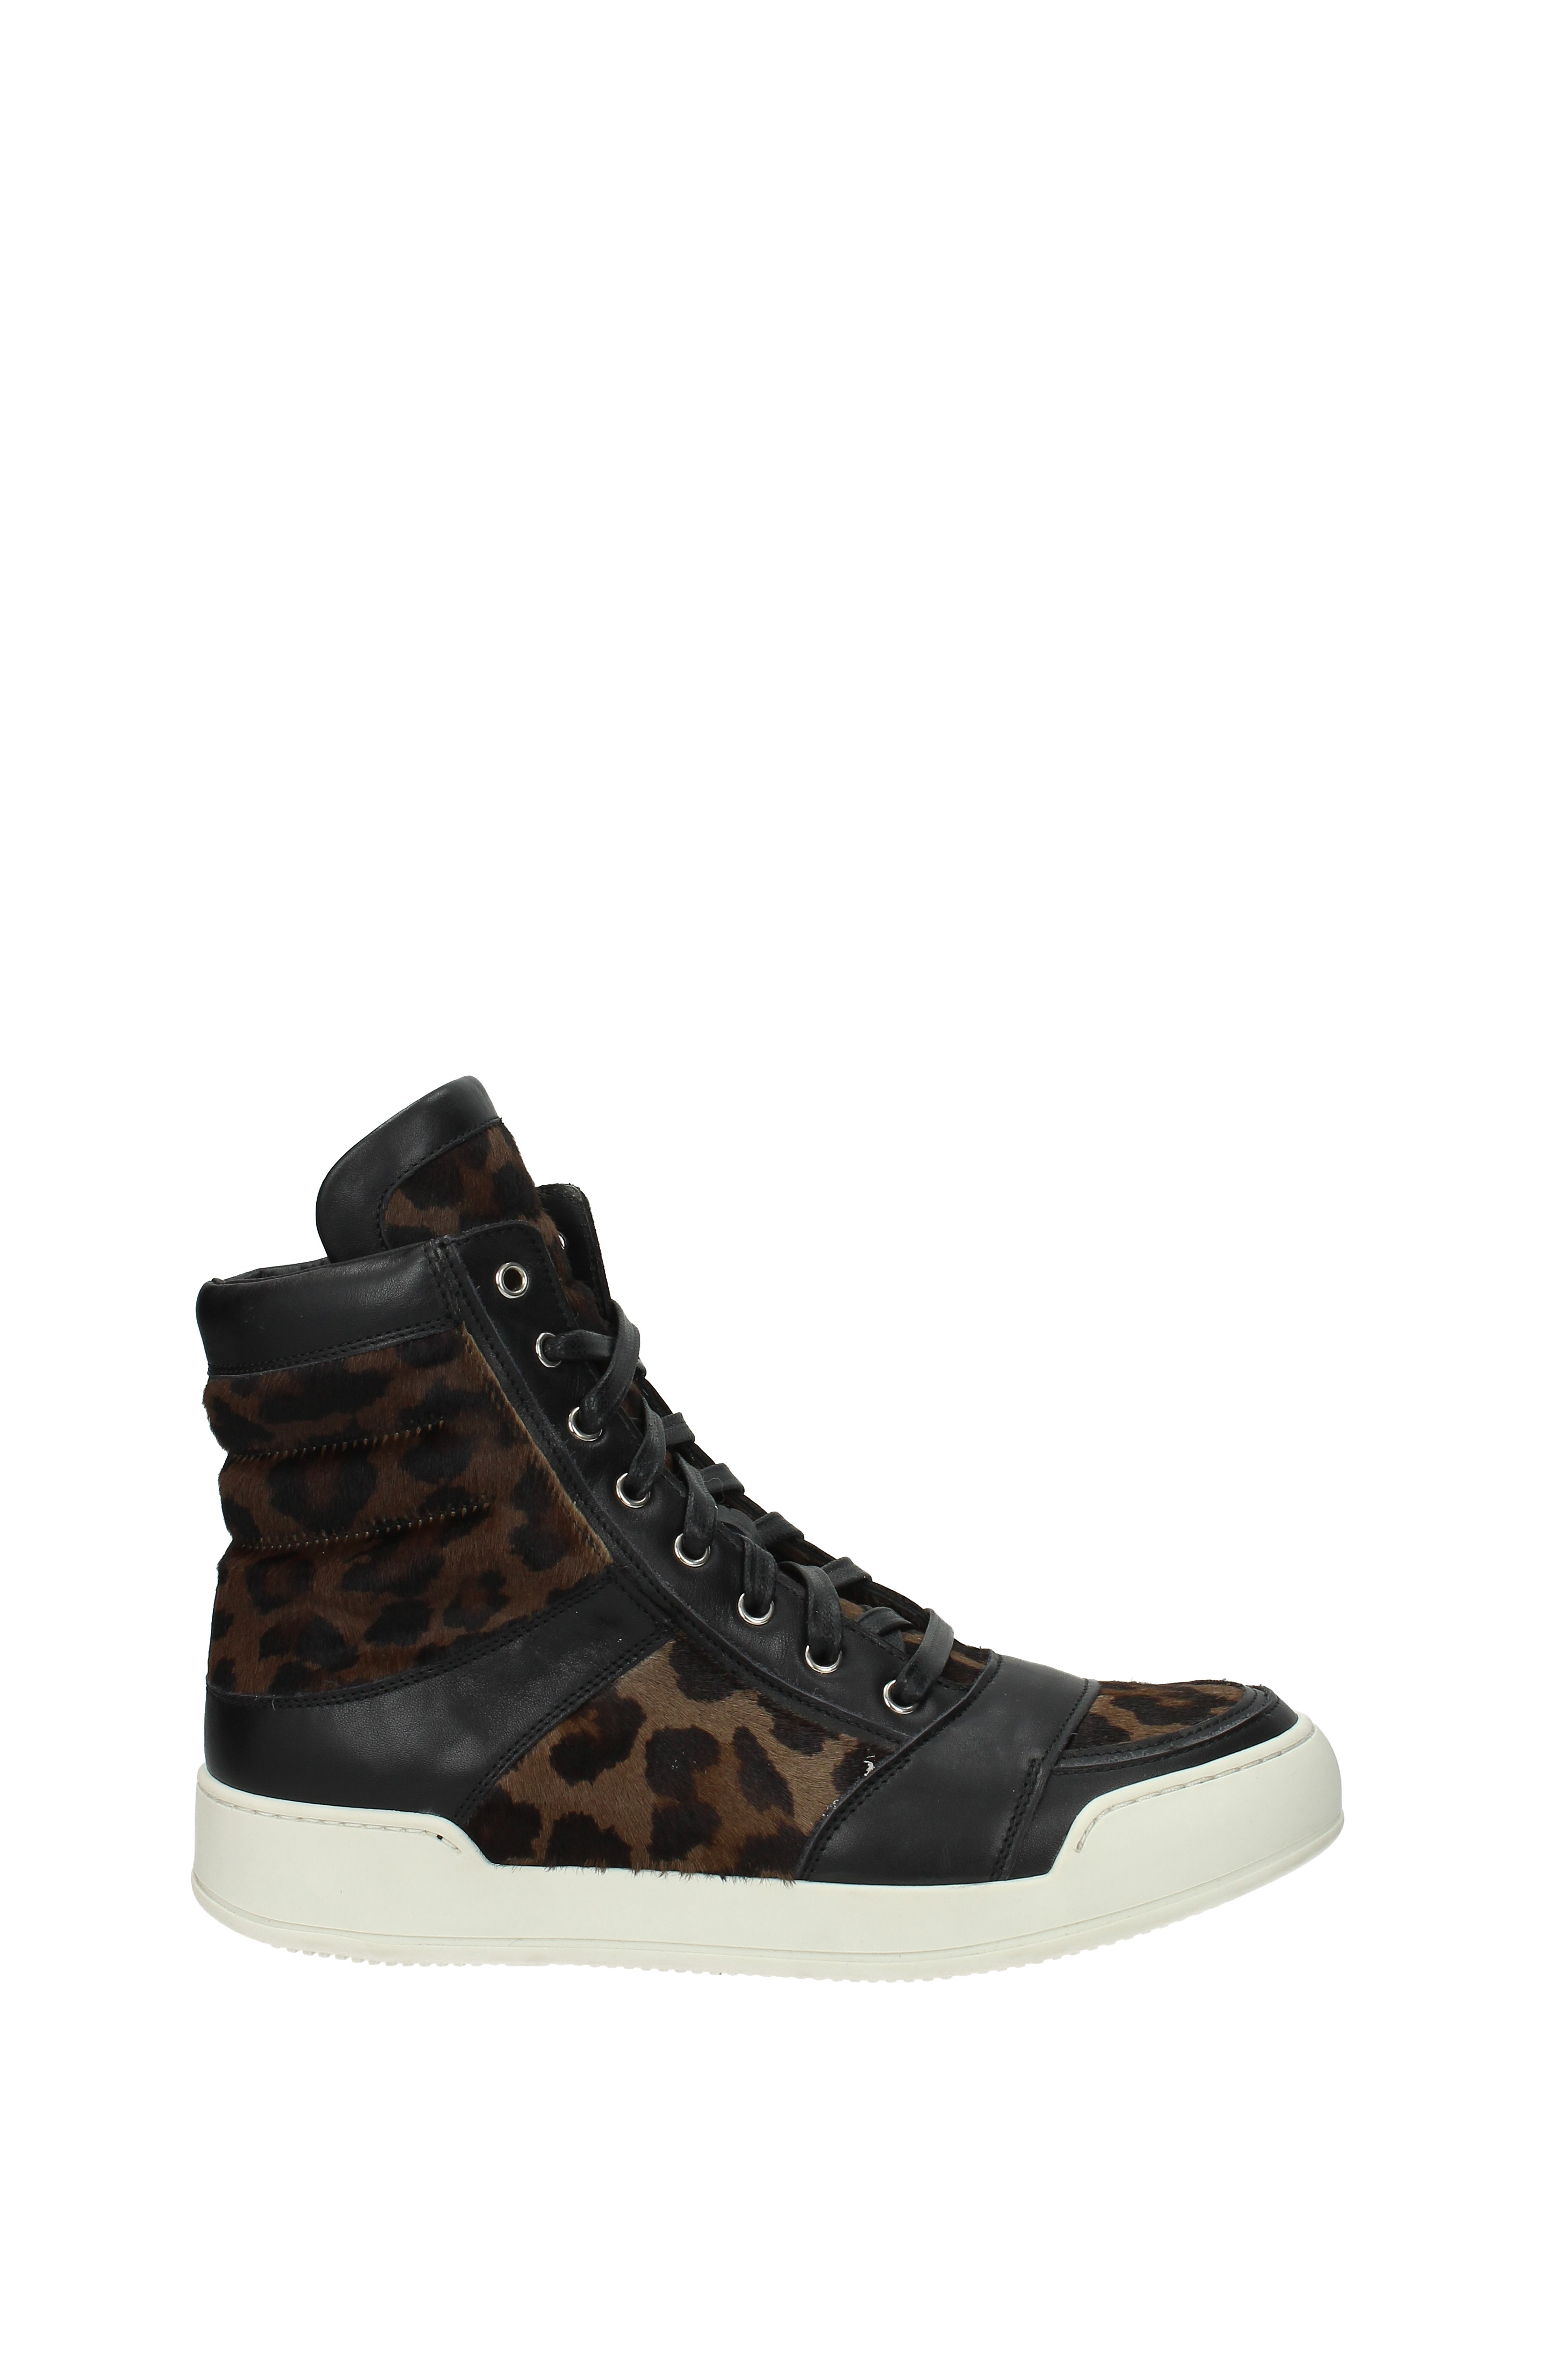 best sneakers 286ac 07e1e ... Stivaletti Balmain Uomo - Cavallino Cavallino Cavallino (HT300C695)  d49039